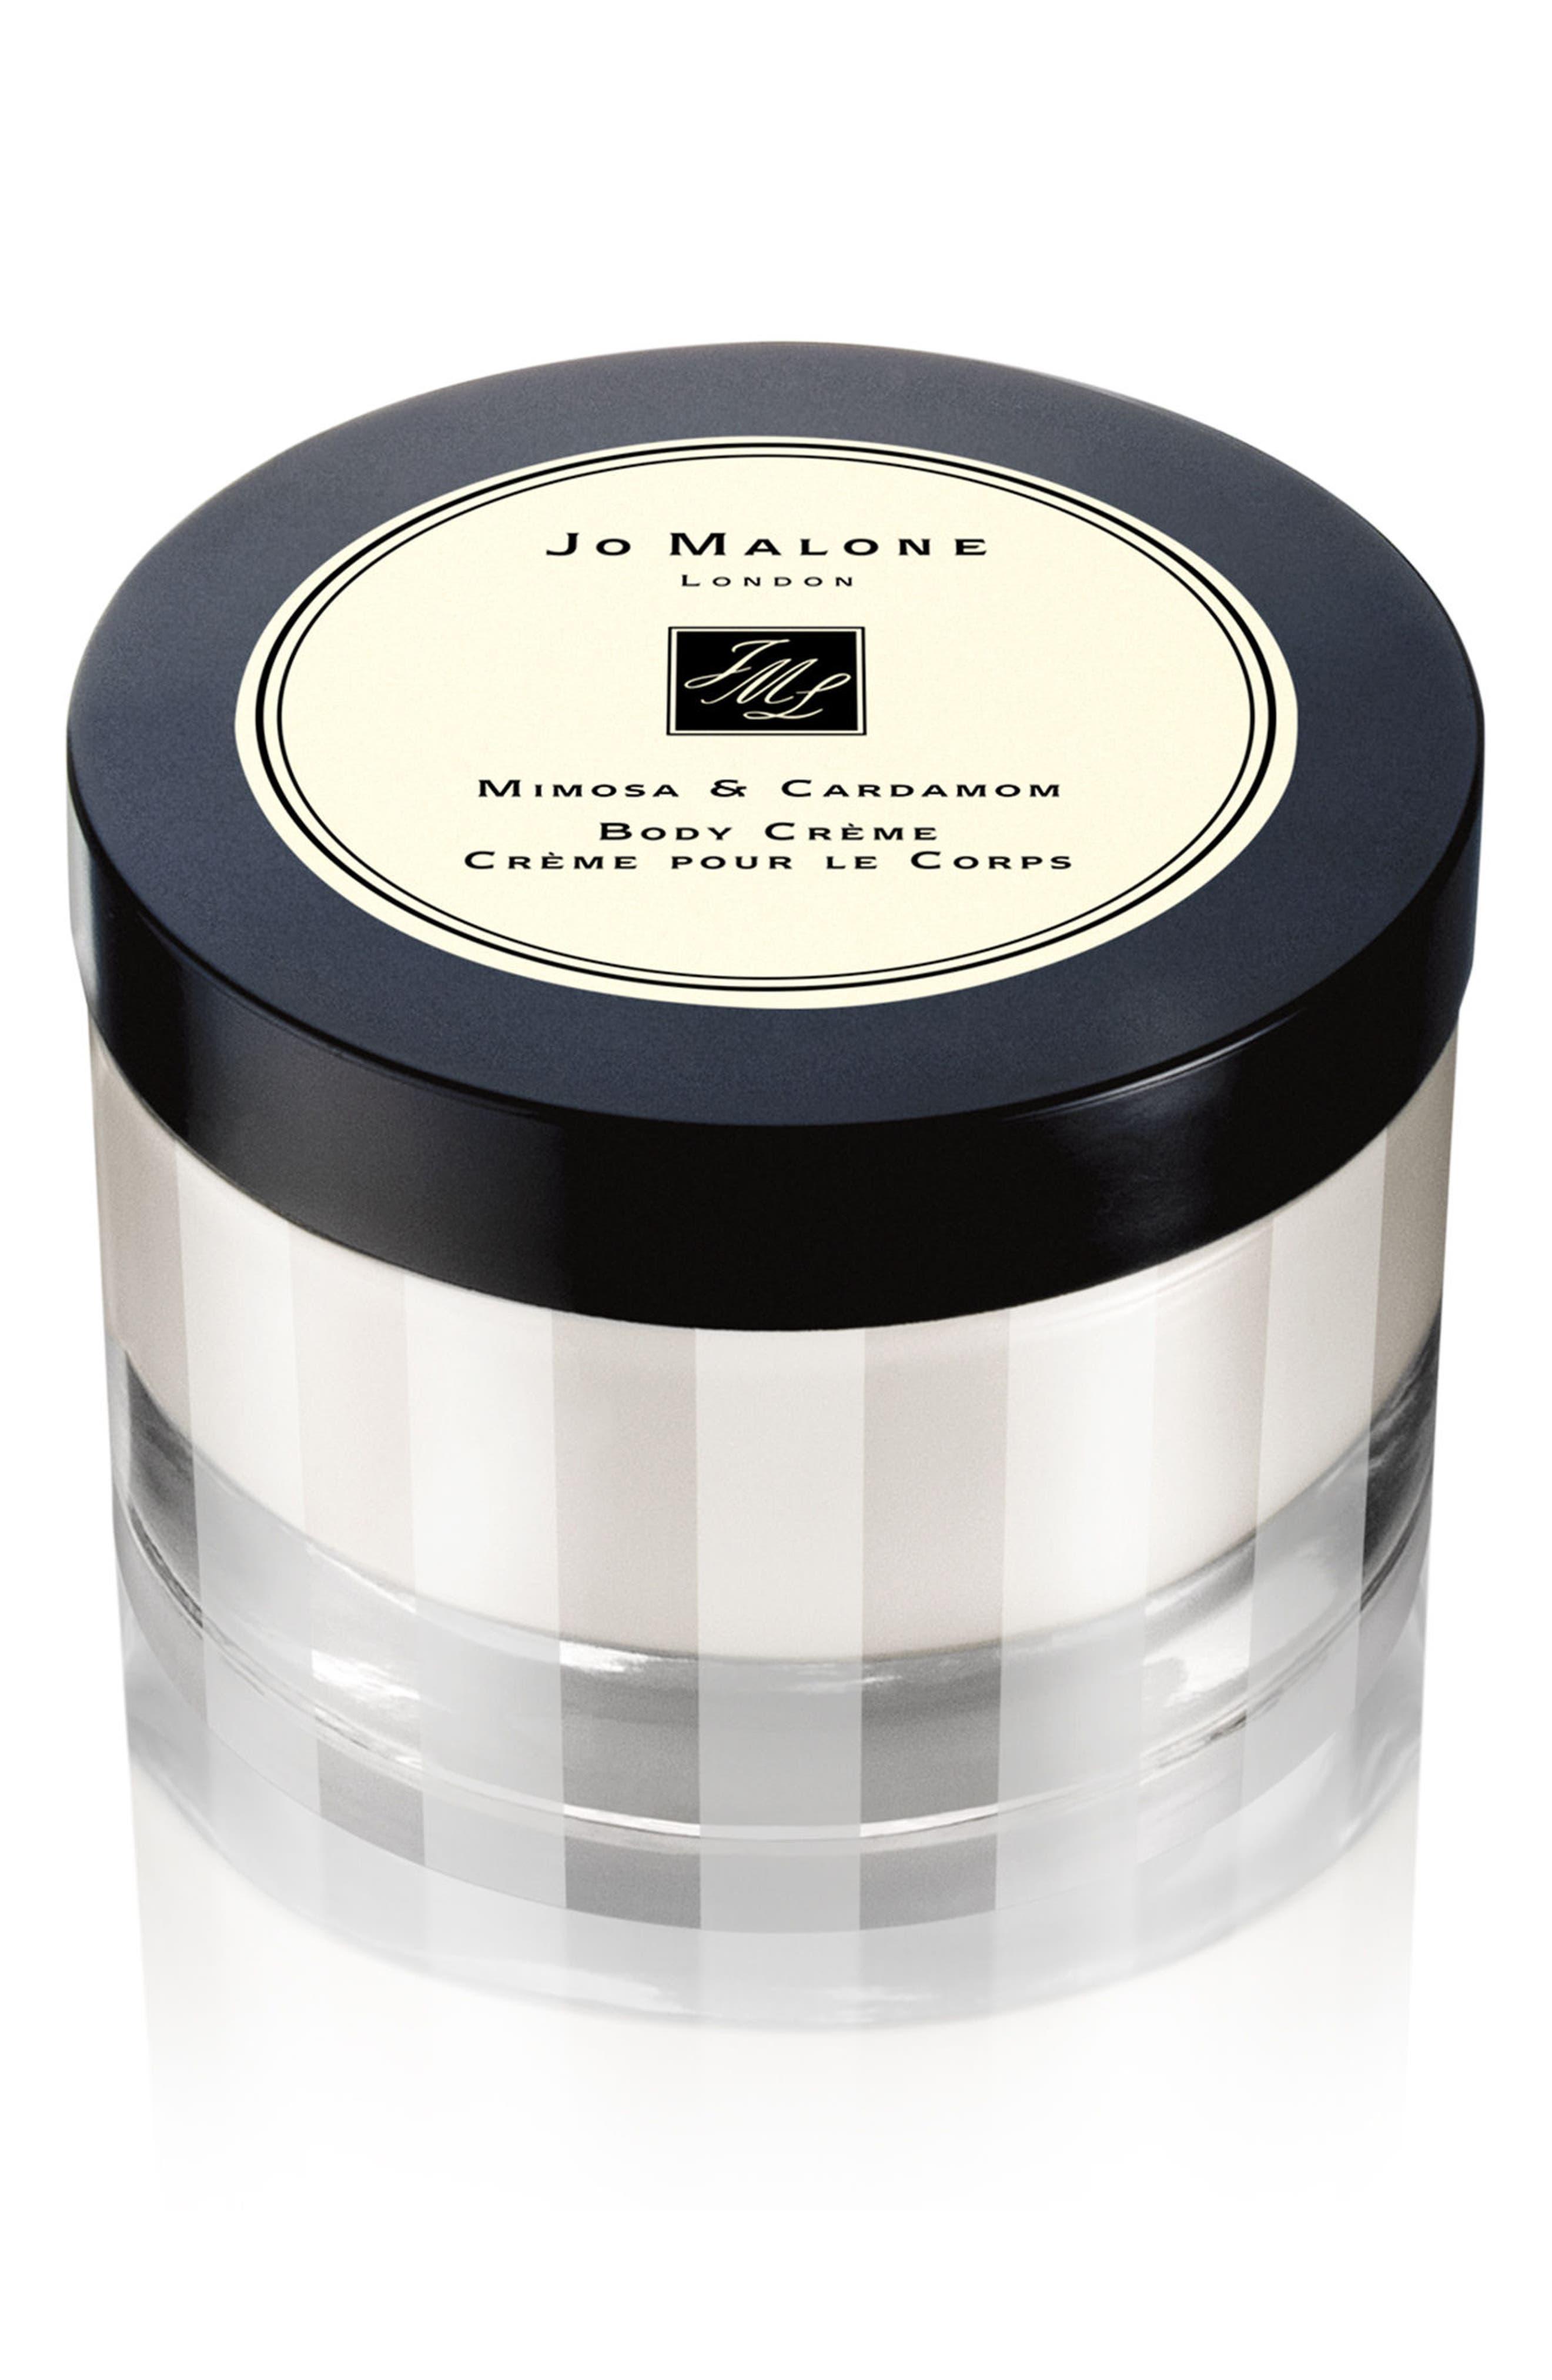 Jo Malone London™ 'Mimosa & Cardamom' Body Crème